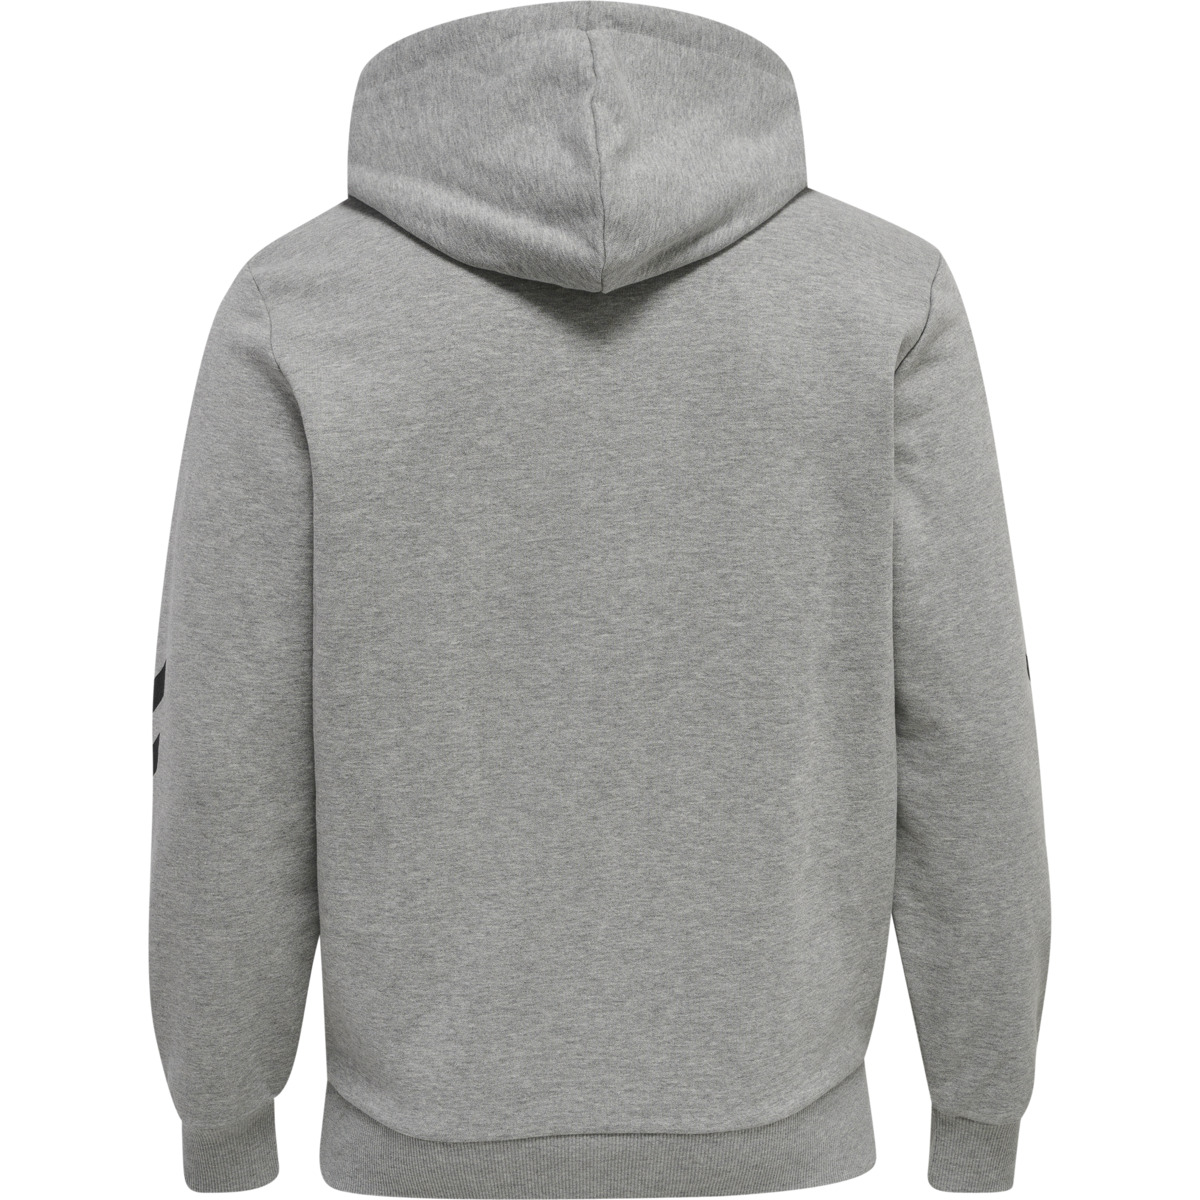 Hummel hmlLGC Graham hoodie, grey melange, xx-large